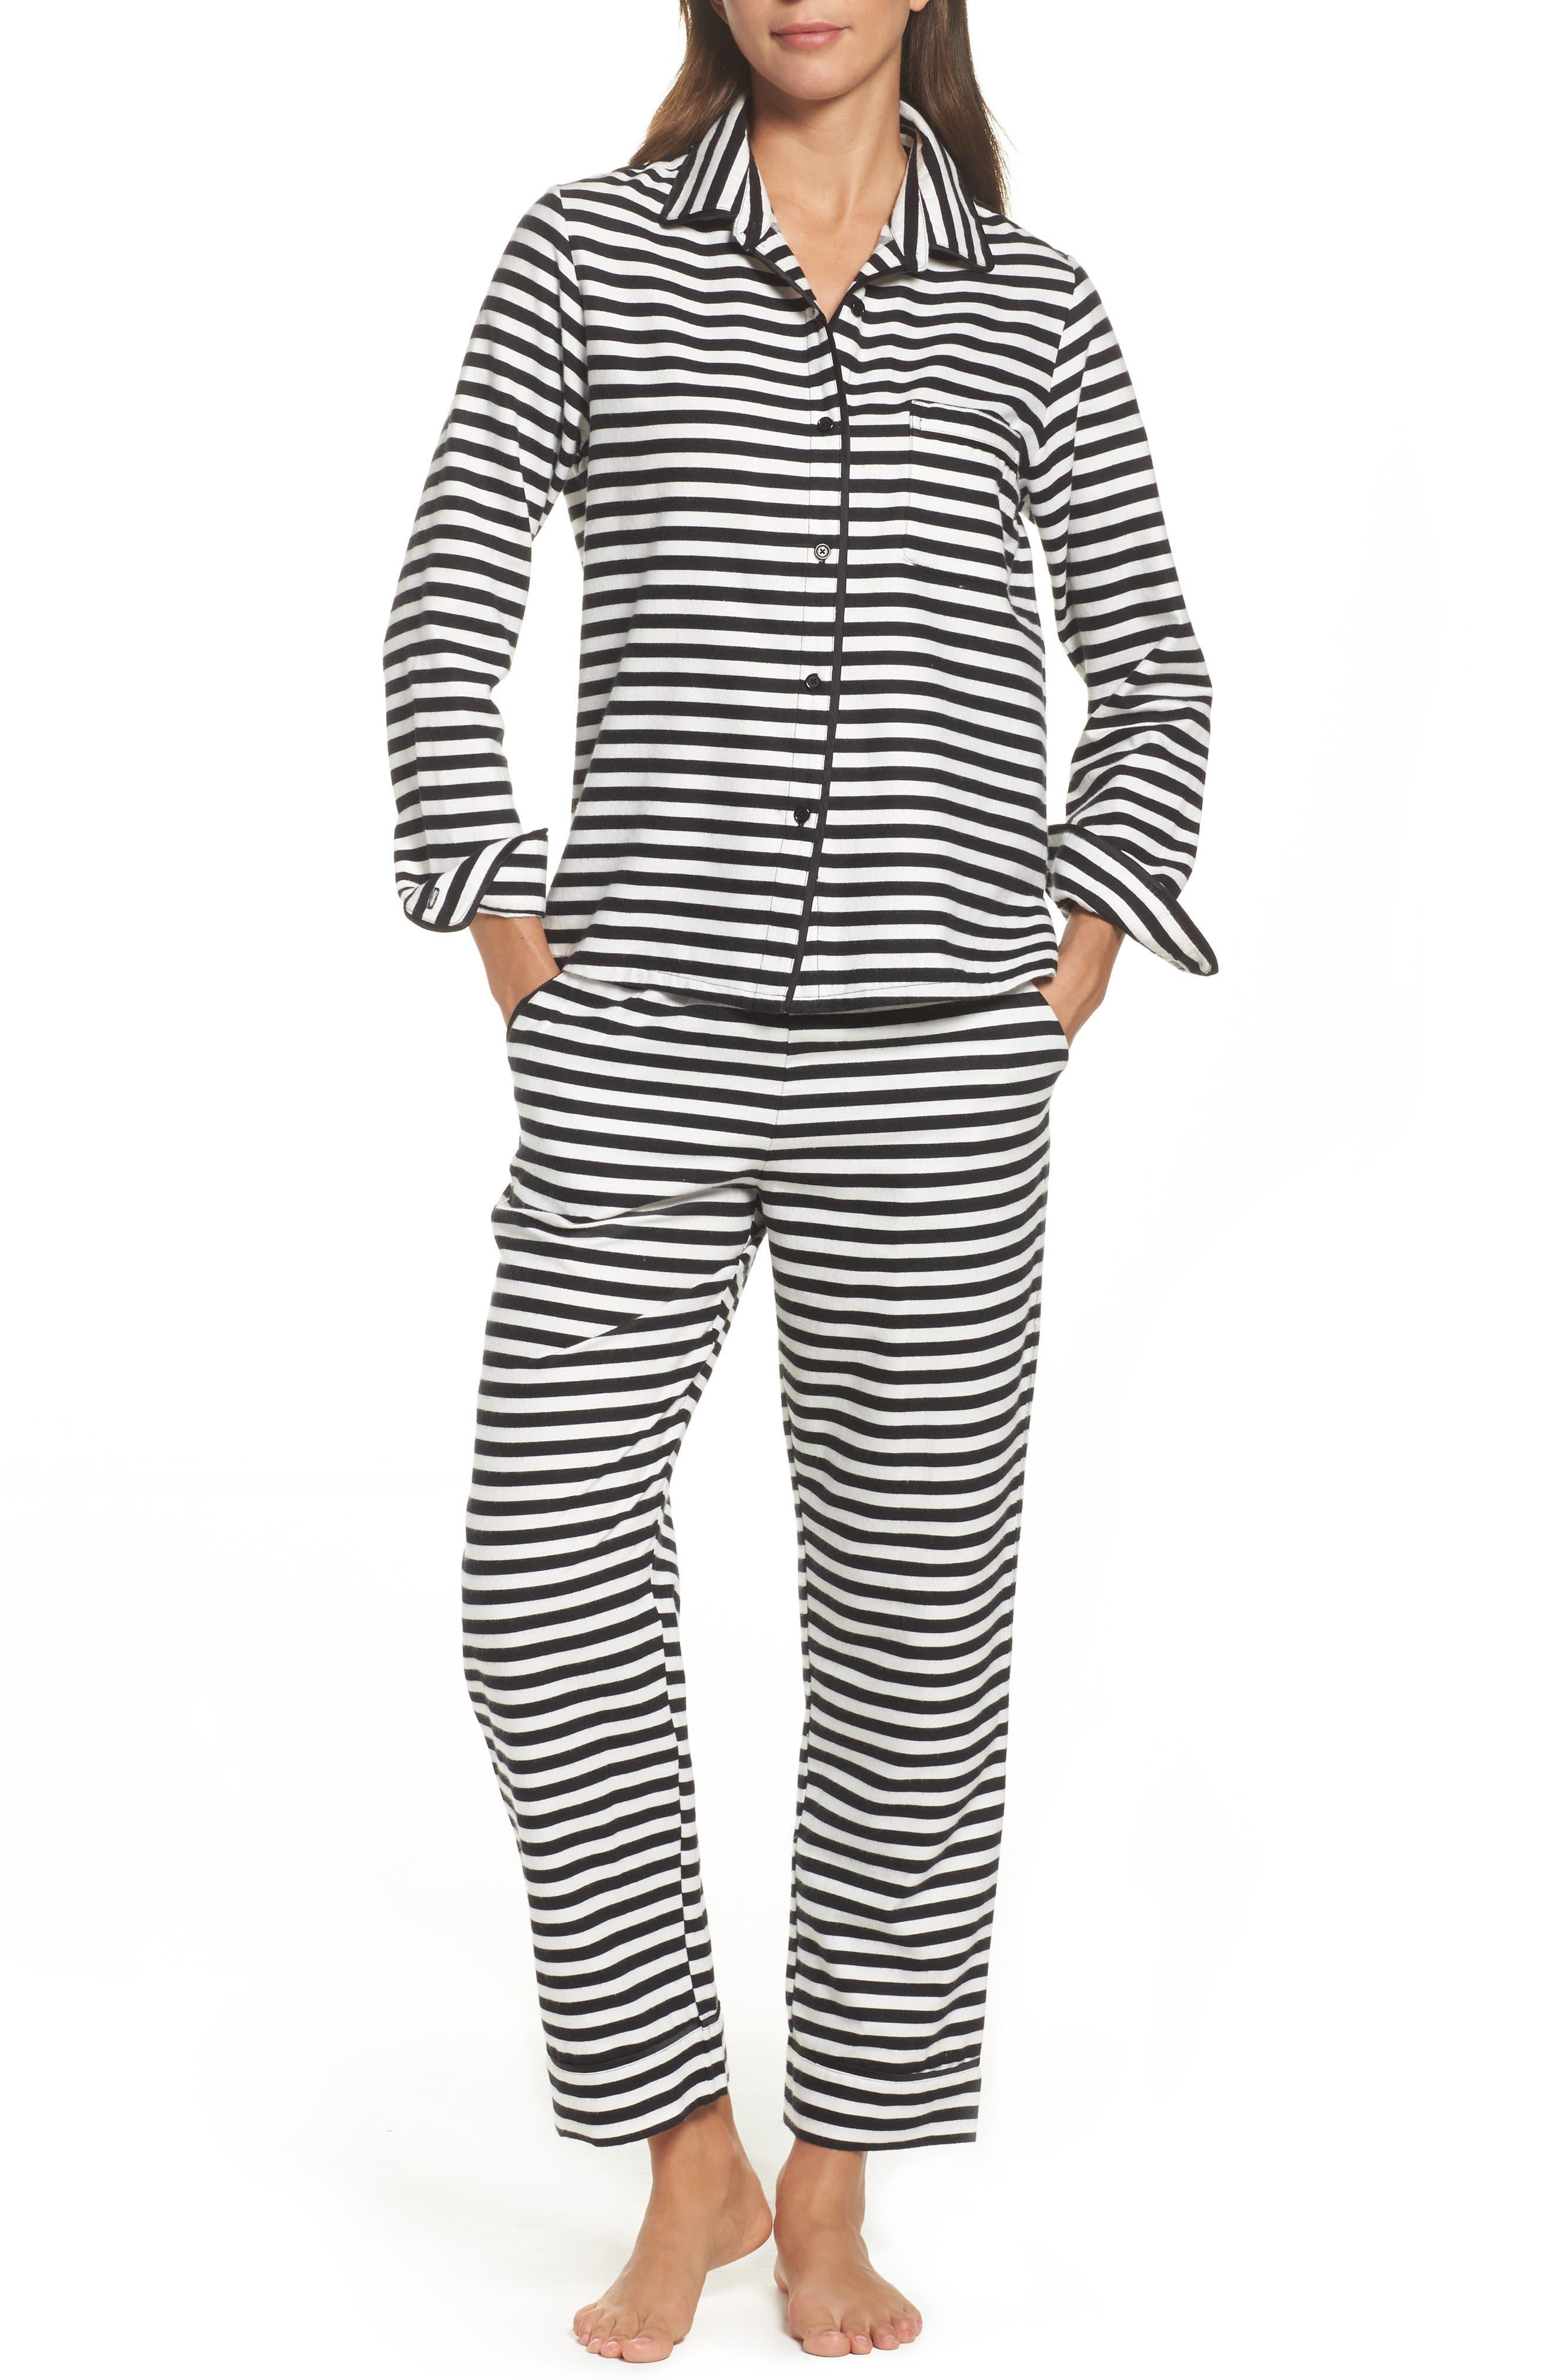 flannel pajamas,                             Main thumbnail 1, color,                             008